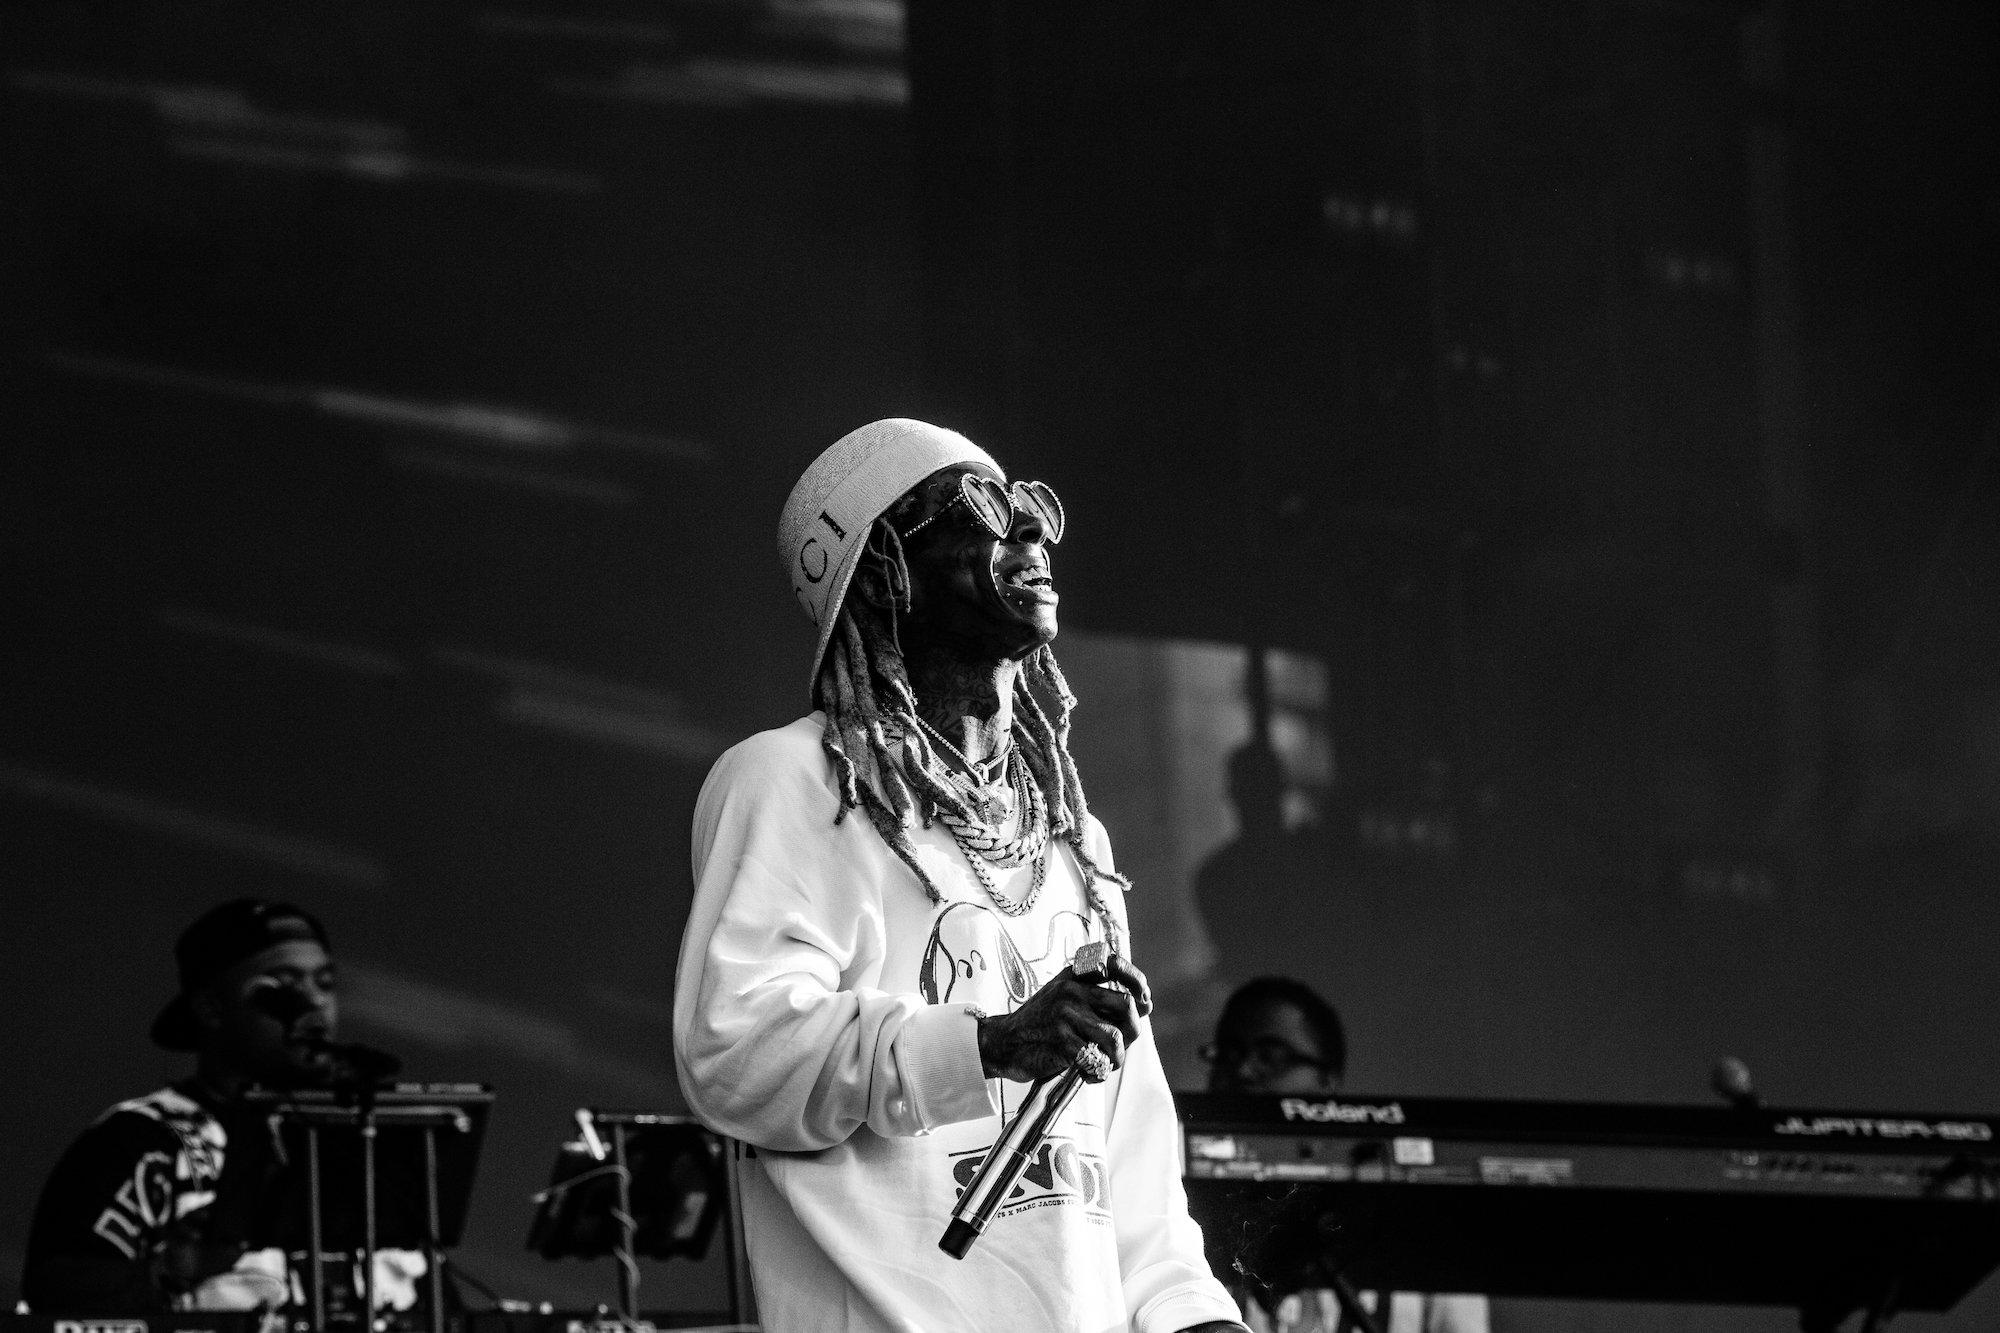 Lollapalooza 2019 - Saturday